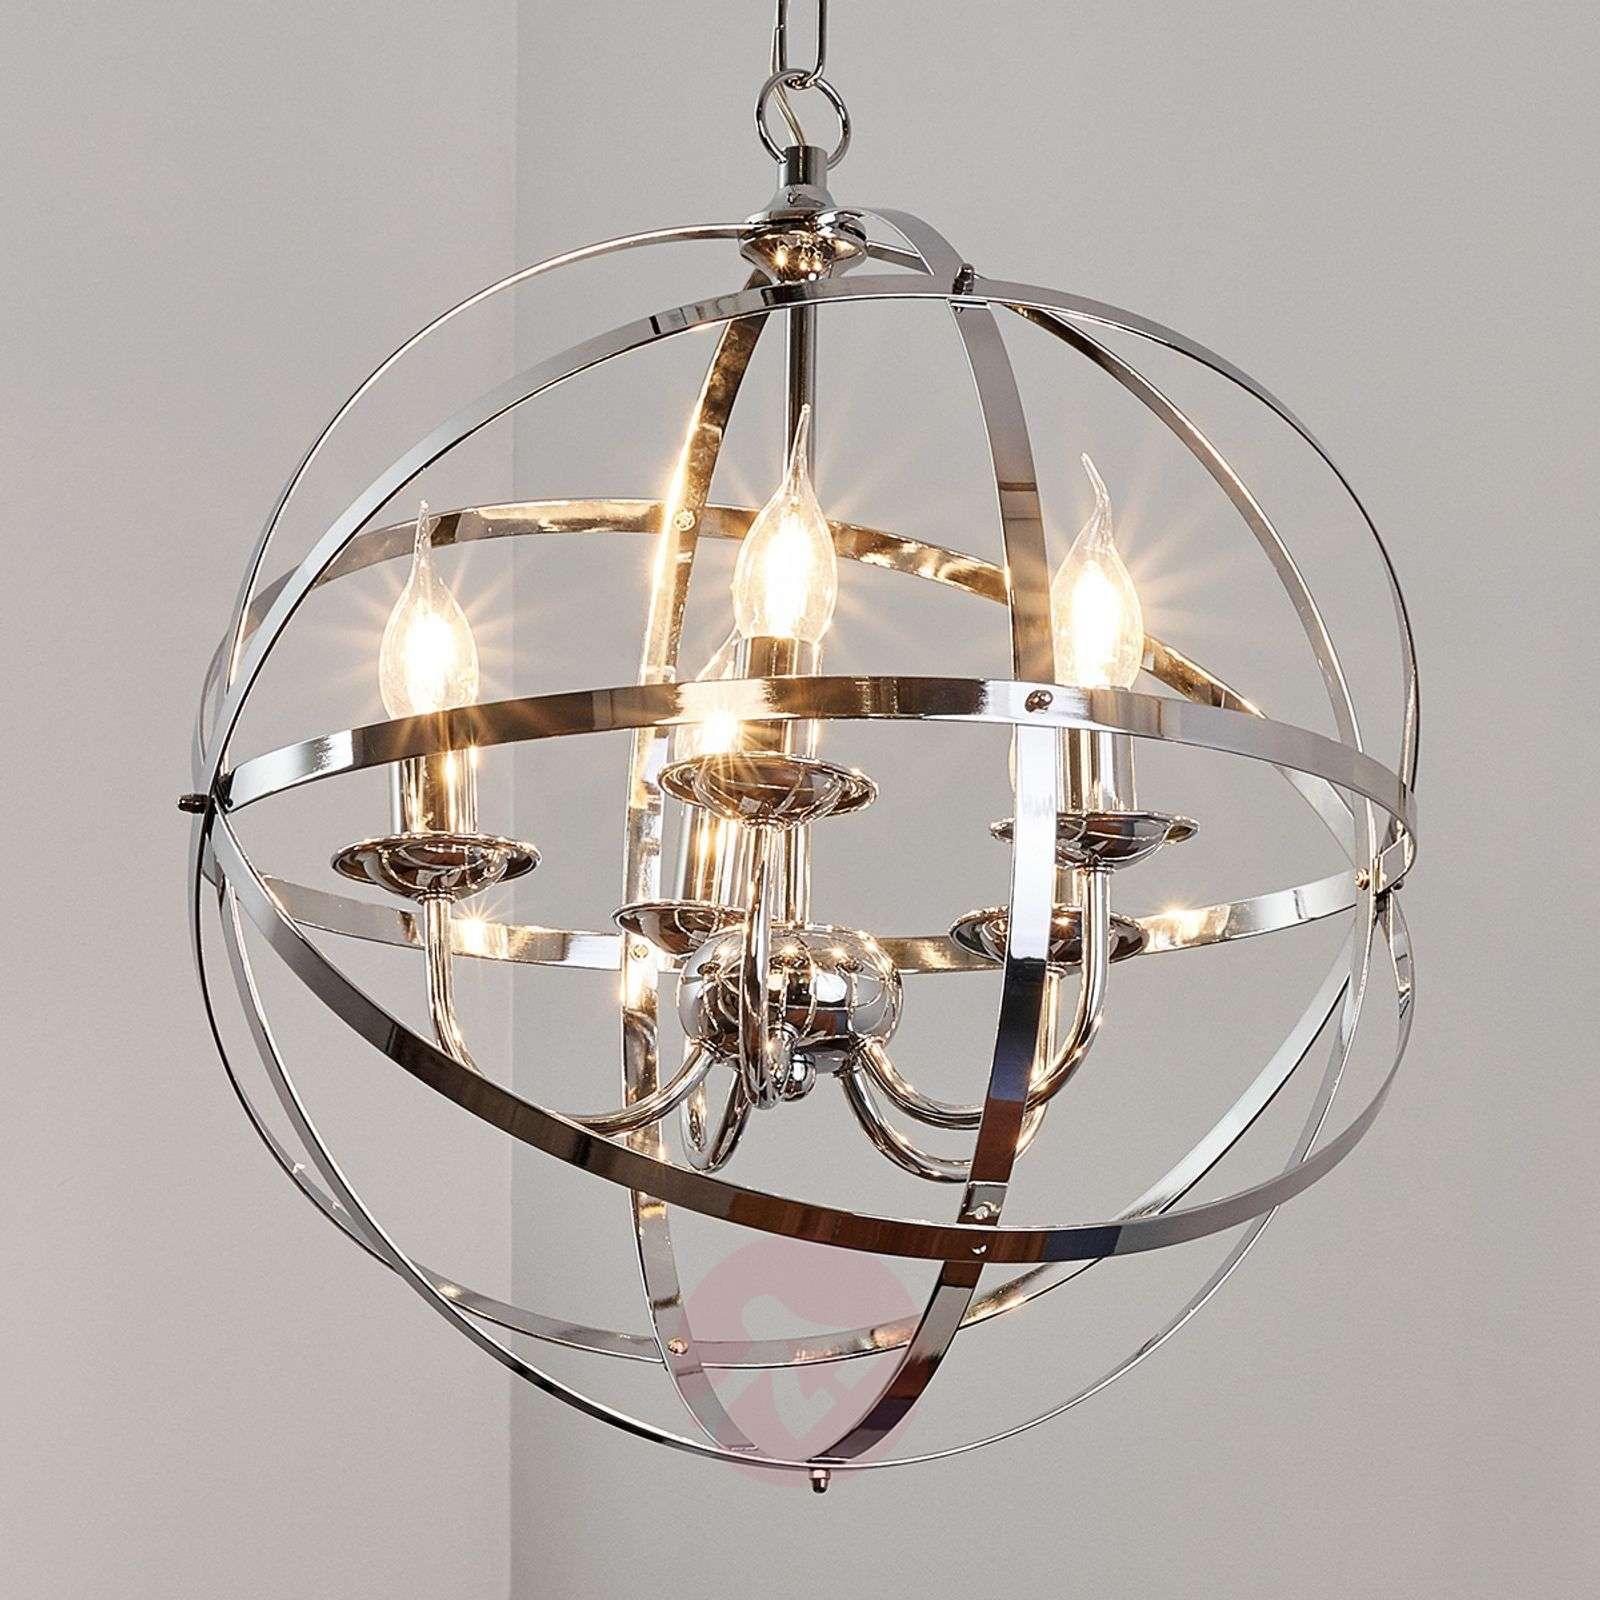 Glossy chrome Patrisia pendant lamp-9973006-01